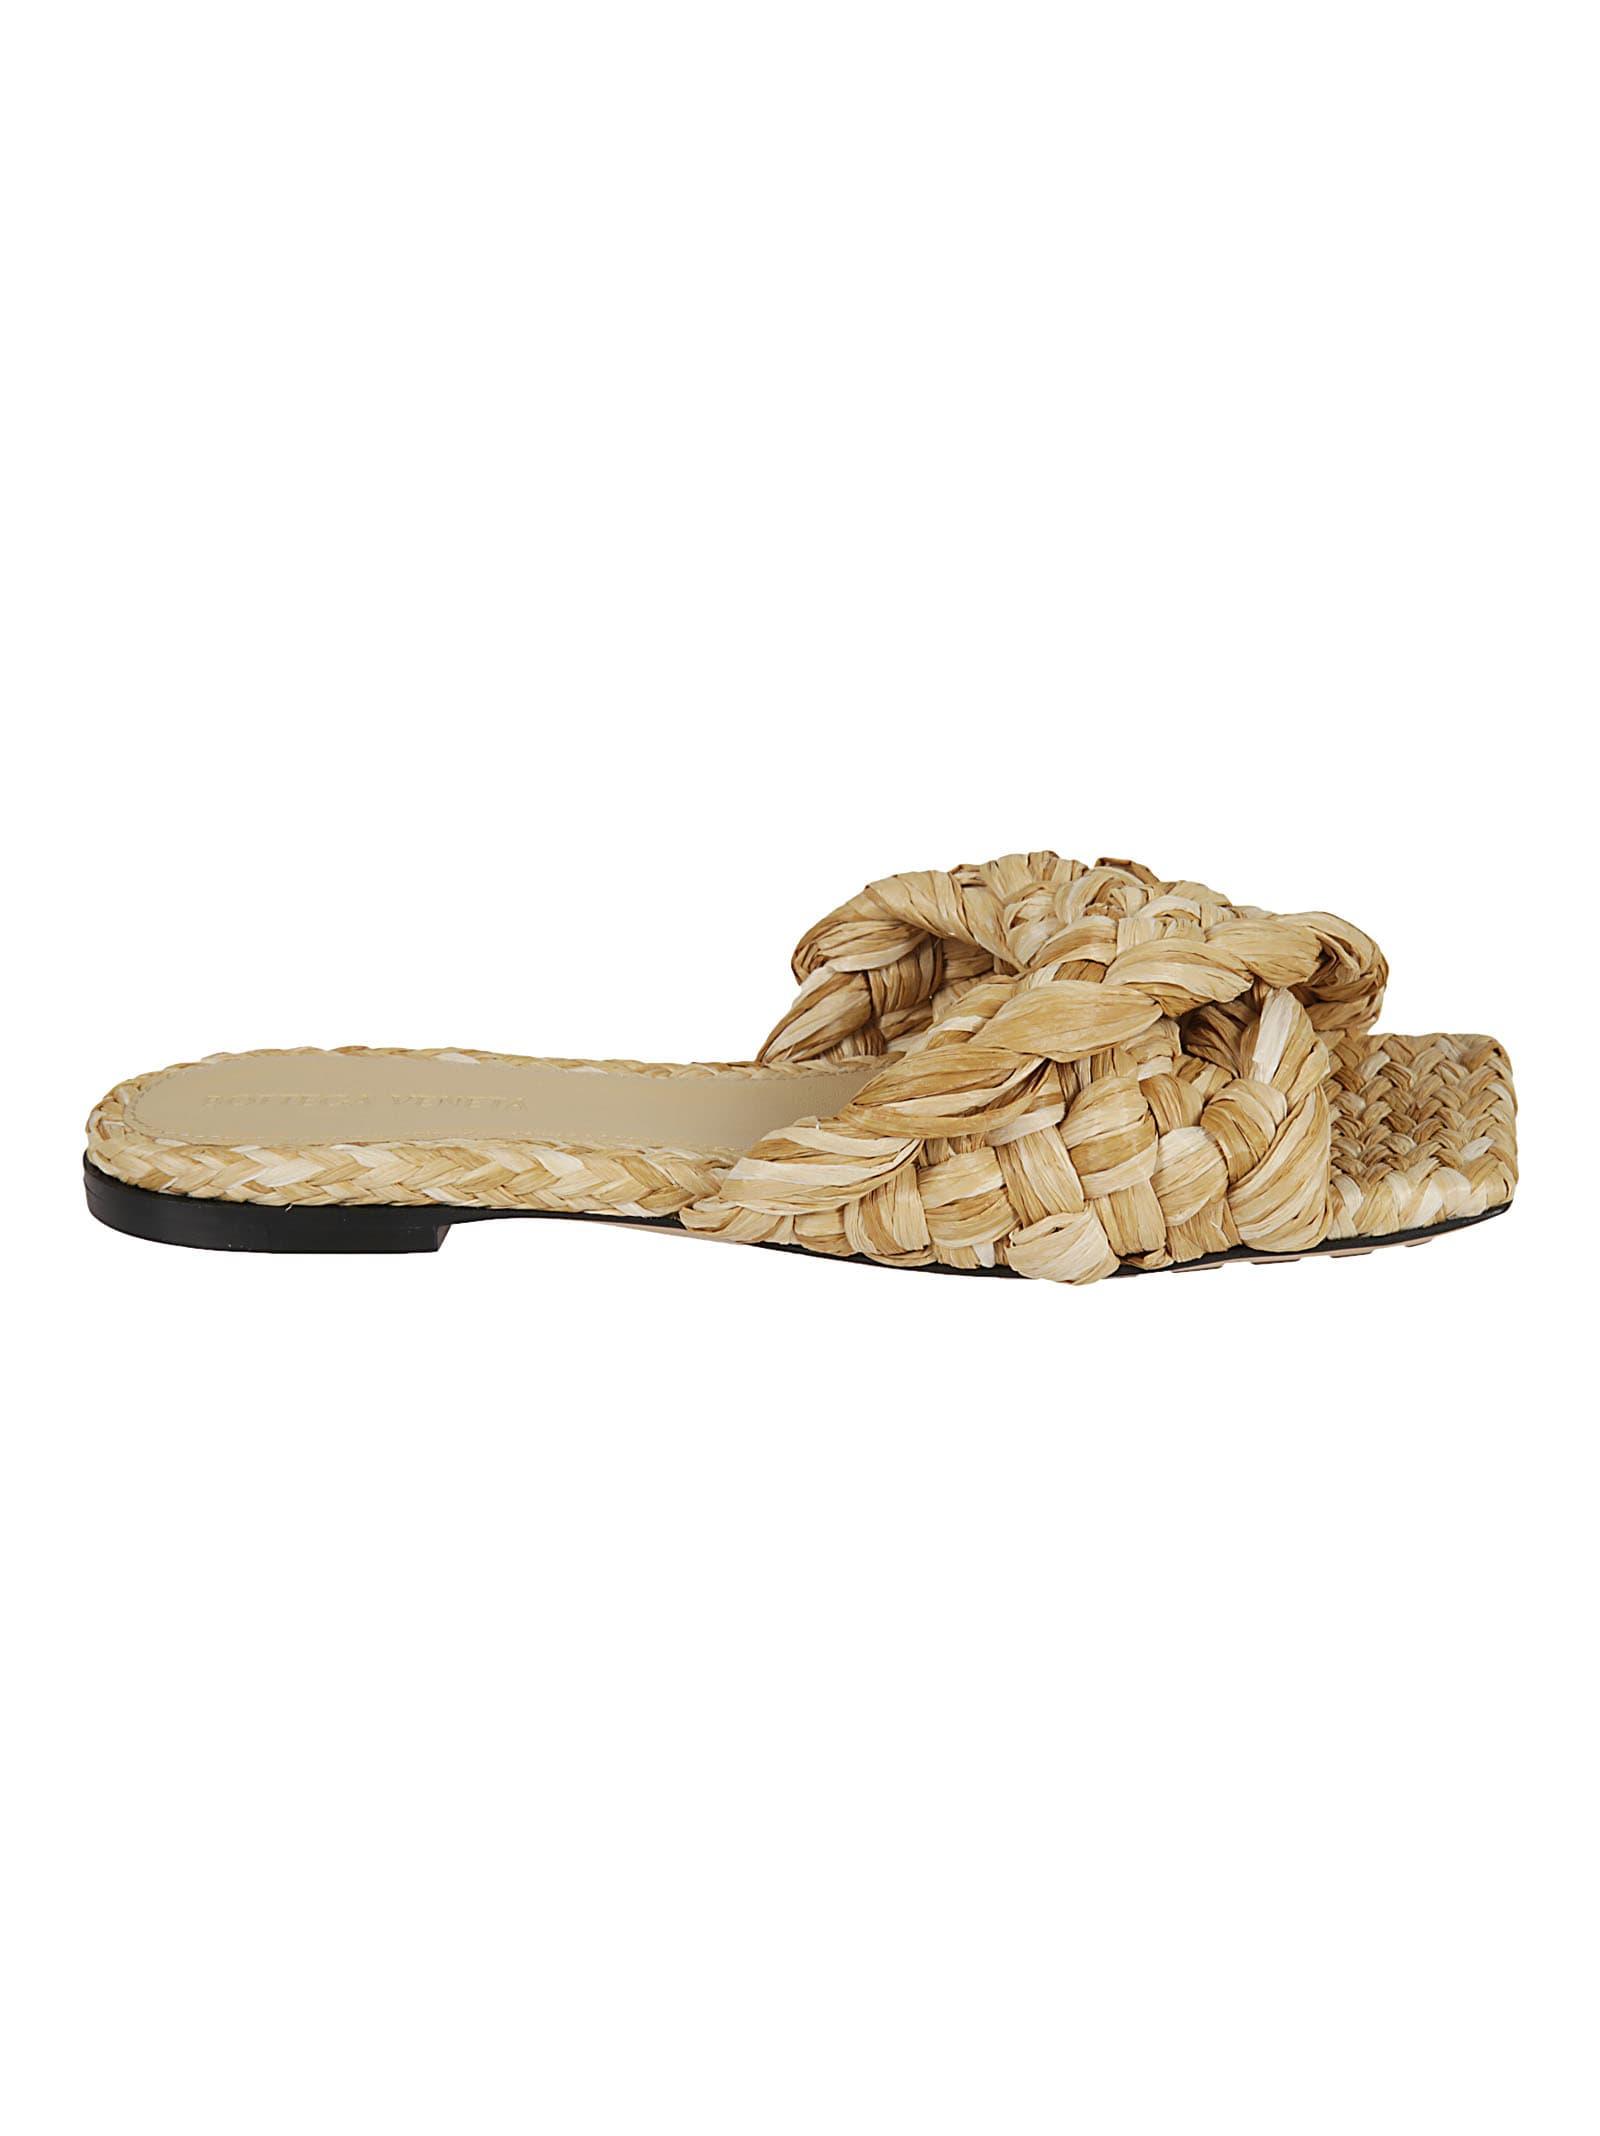 Bottega Veneta Stretch Intreccio Raffia Sandals